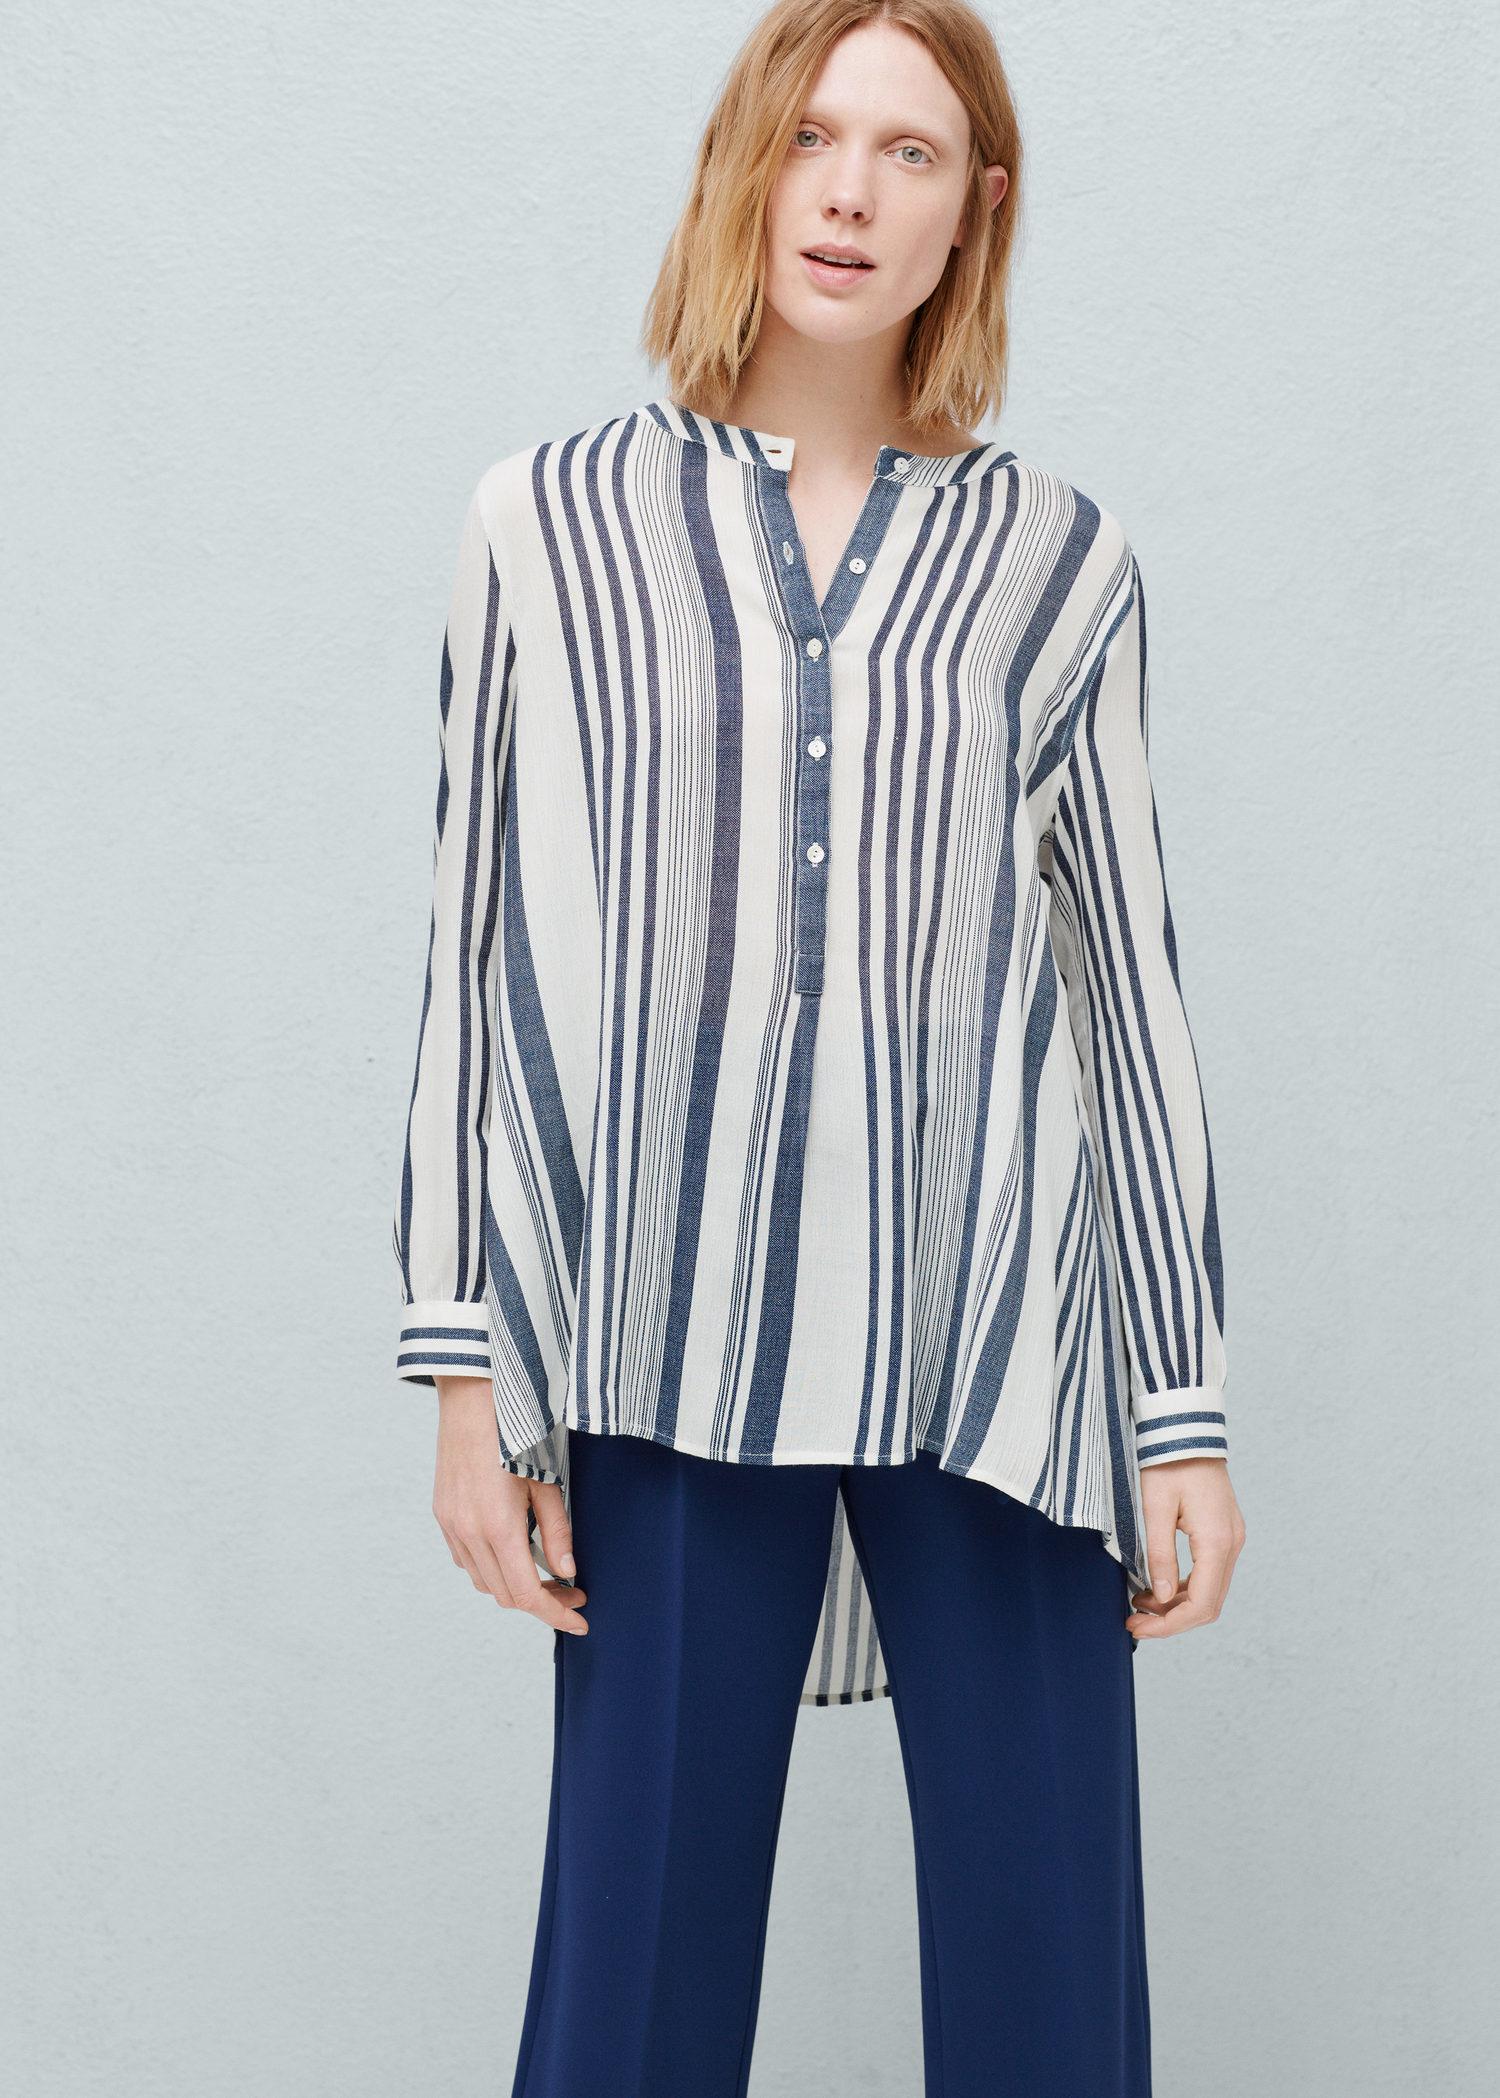 540c3d5232 Mango Striped Shirt in Blue - Lyst